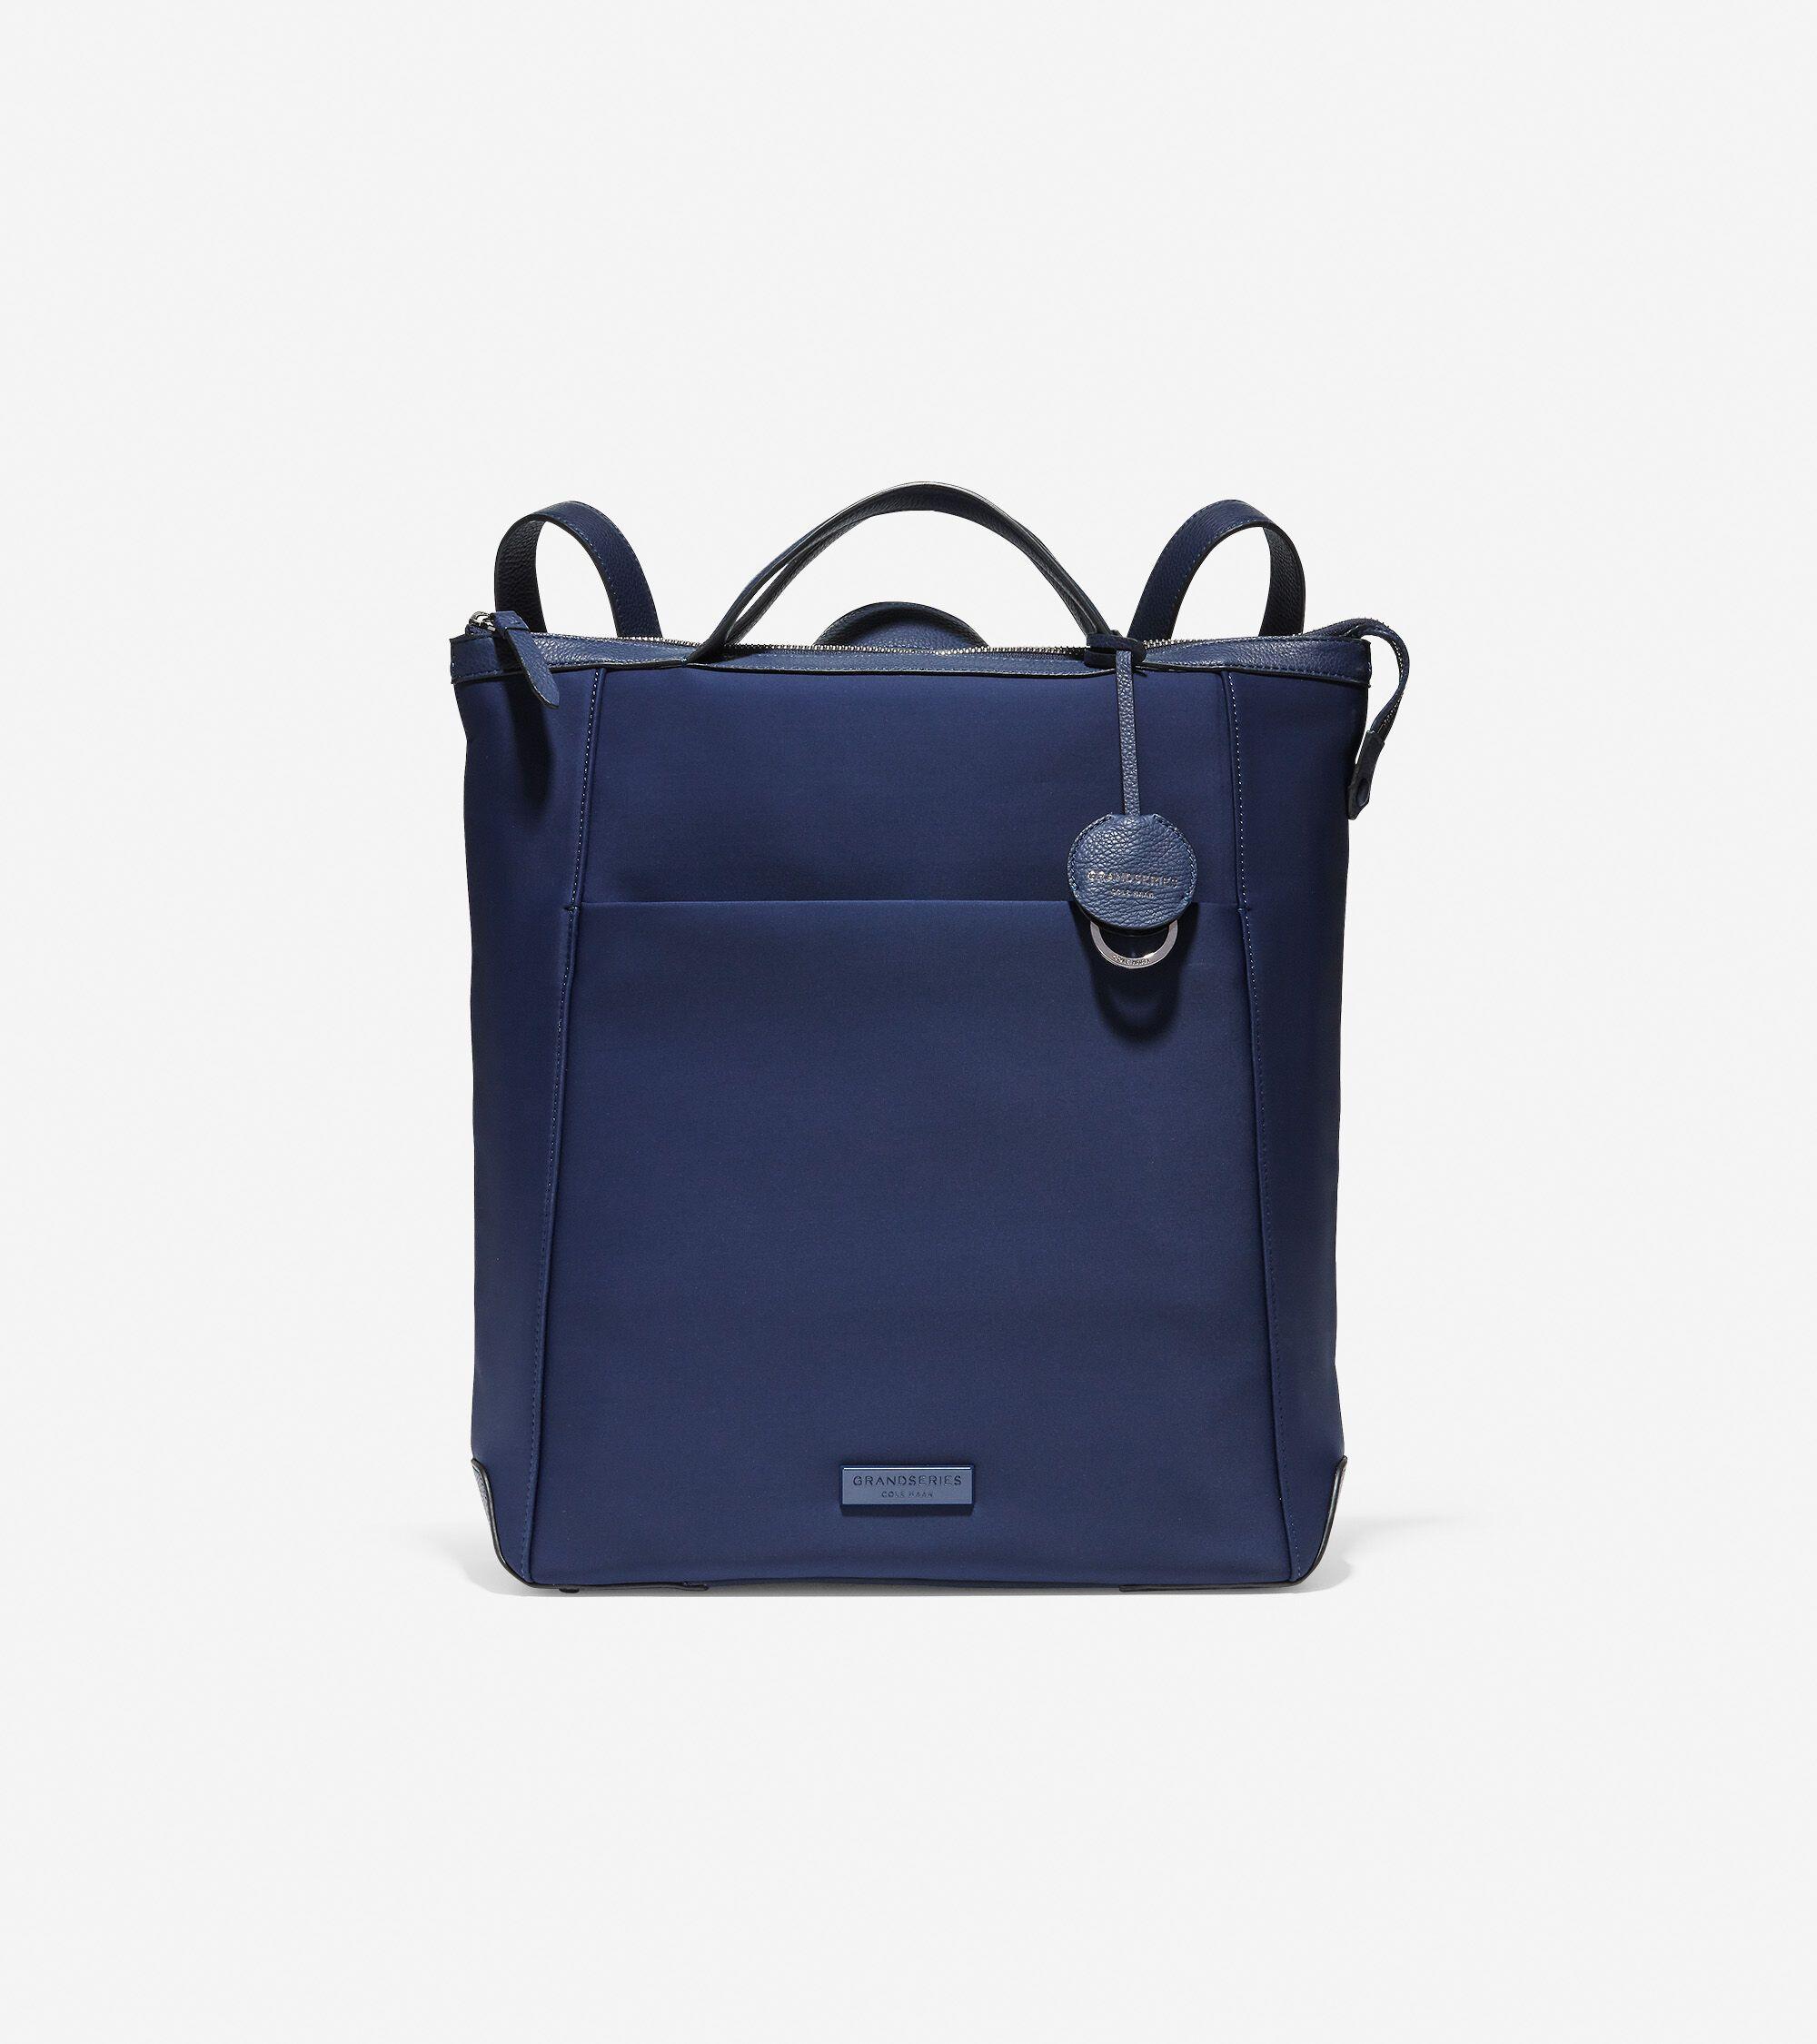 Cole Haan Slim Briefcase Laptop Bag Black Leather